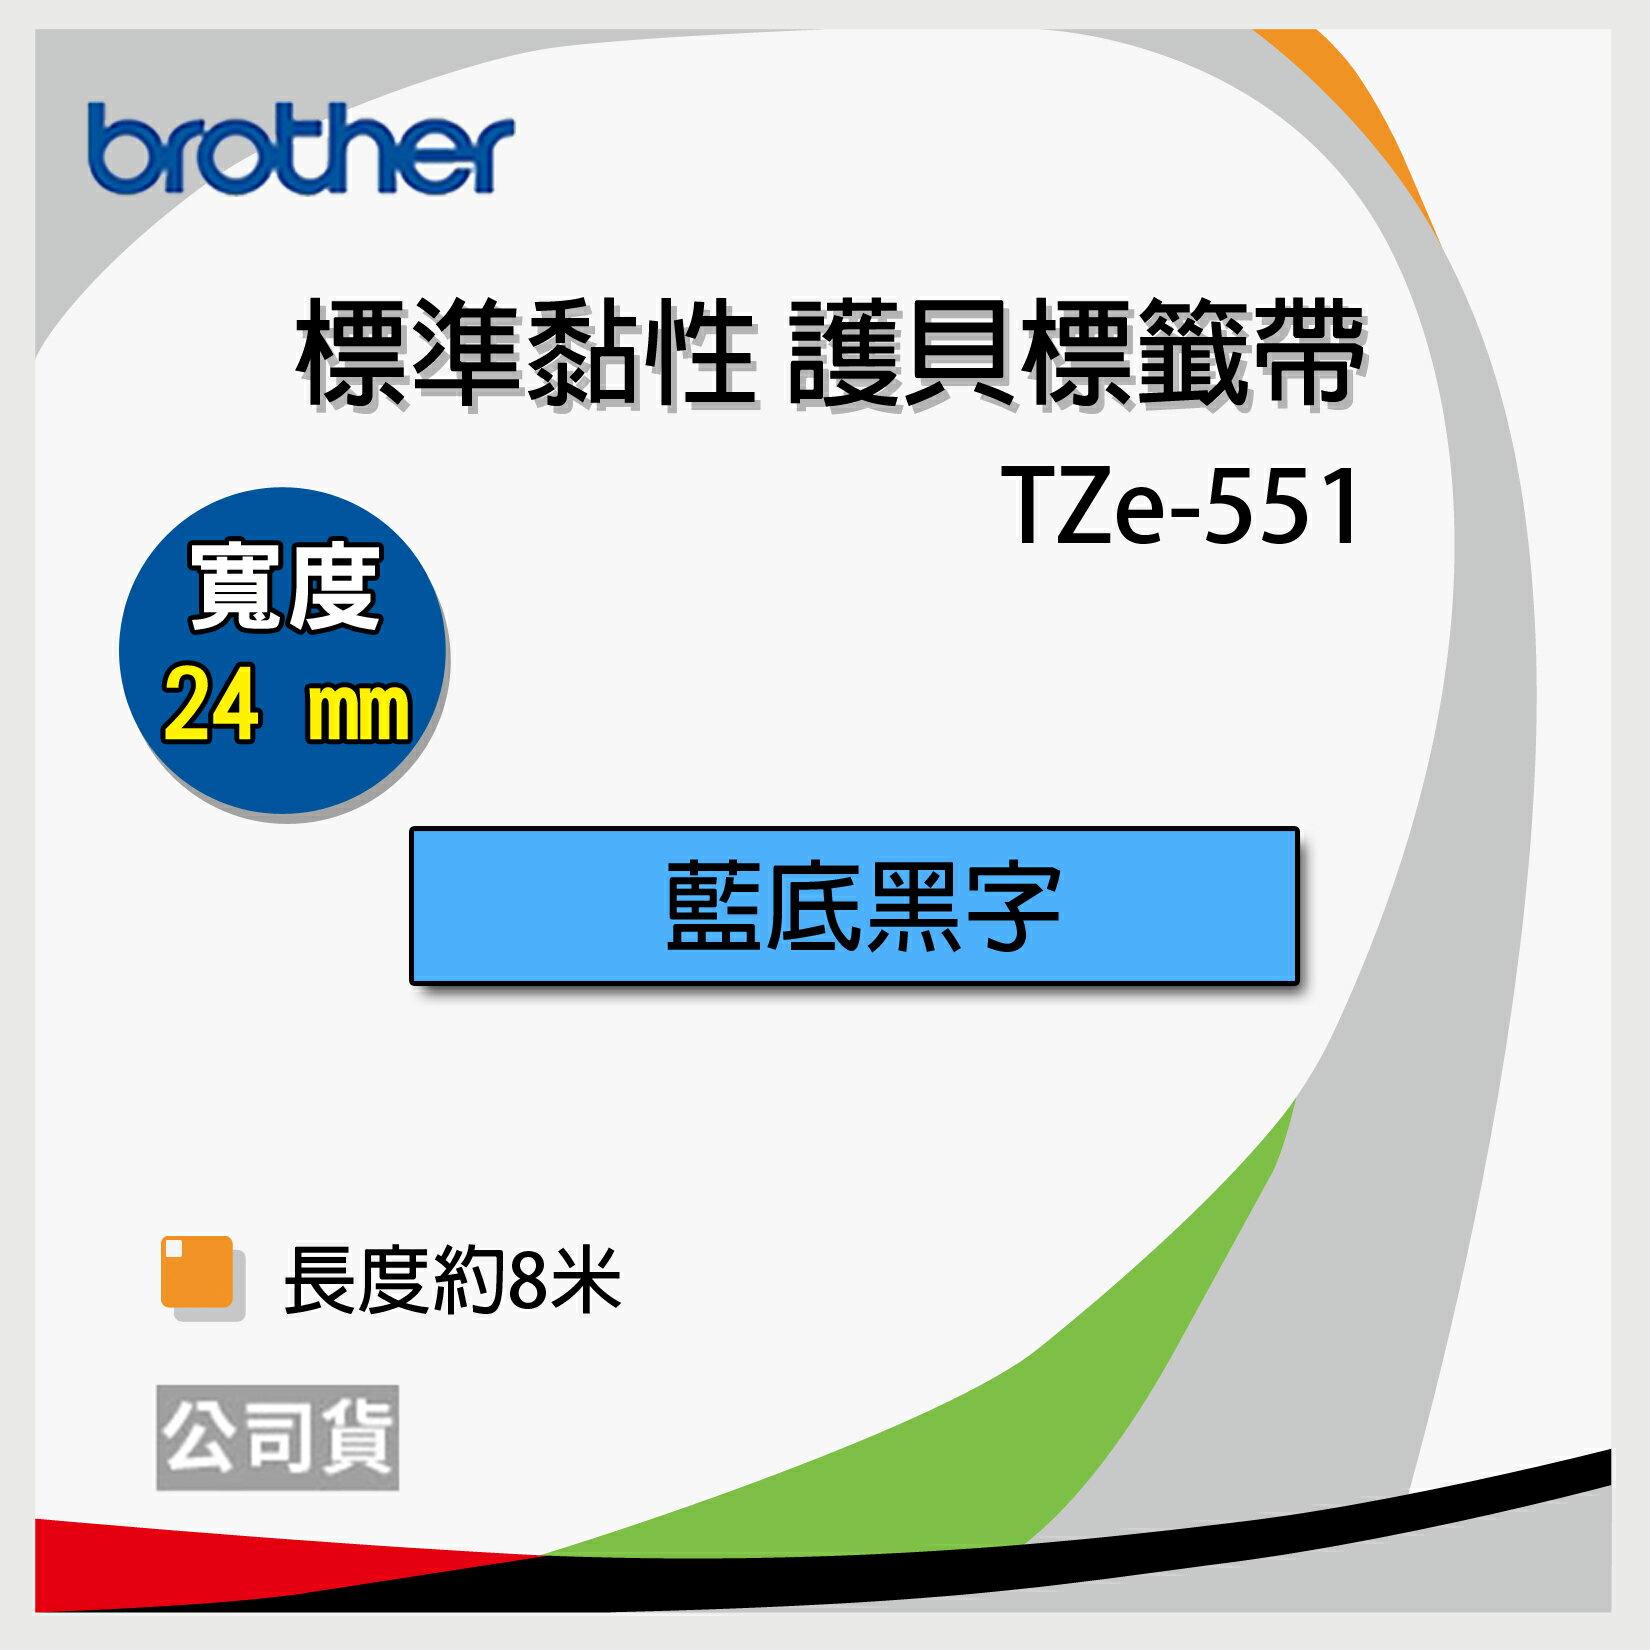 Brother 24mm 原廠護貝標籤帶 TZe-551 藍底黑字標籤帶